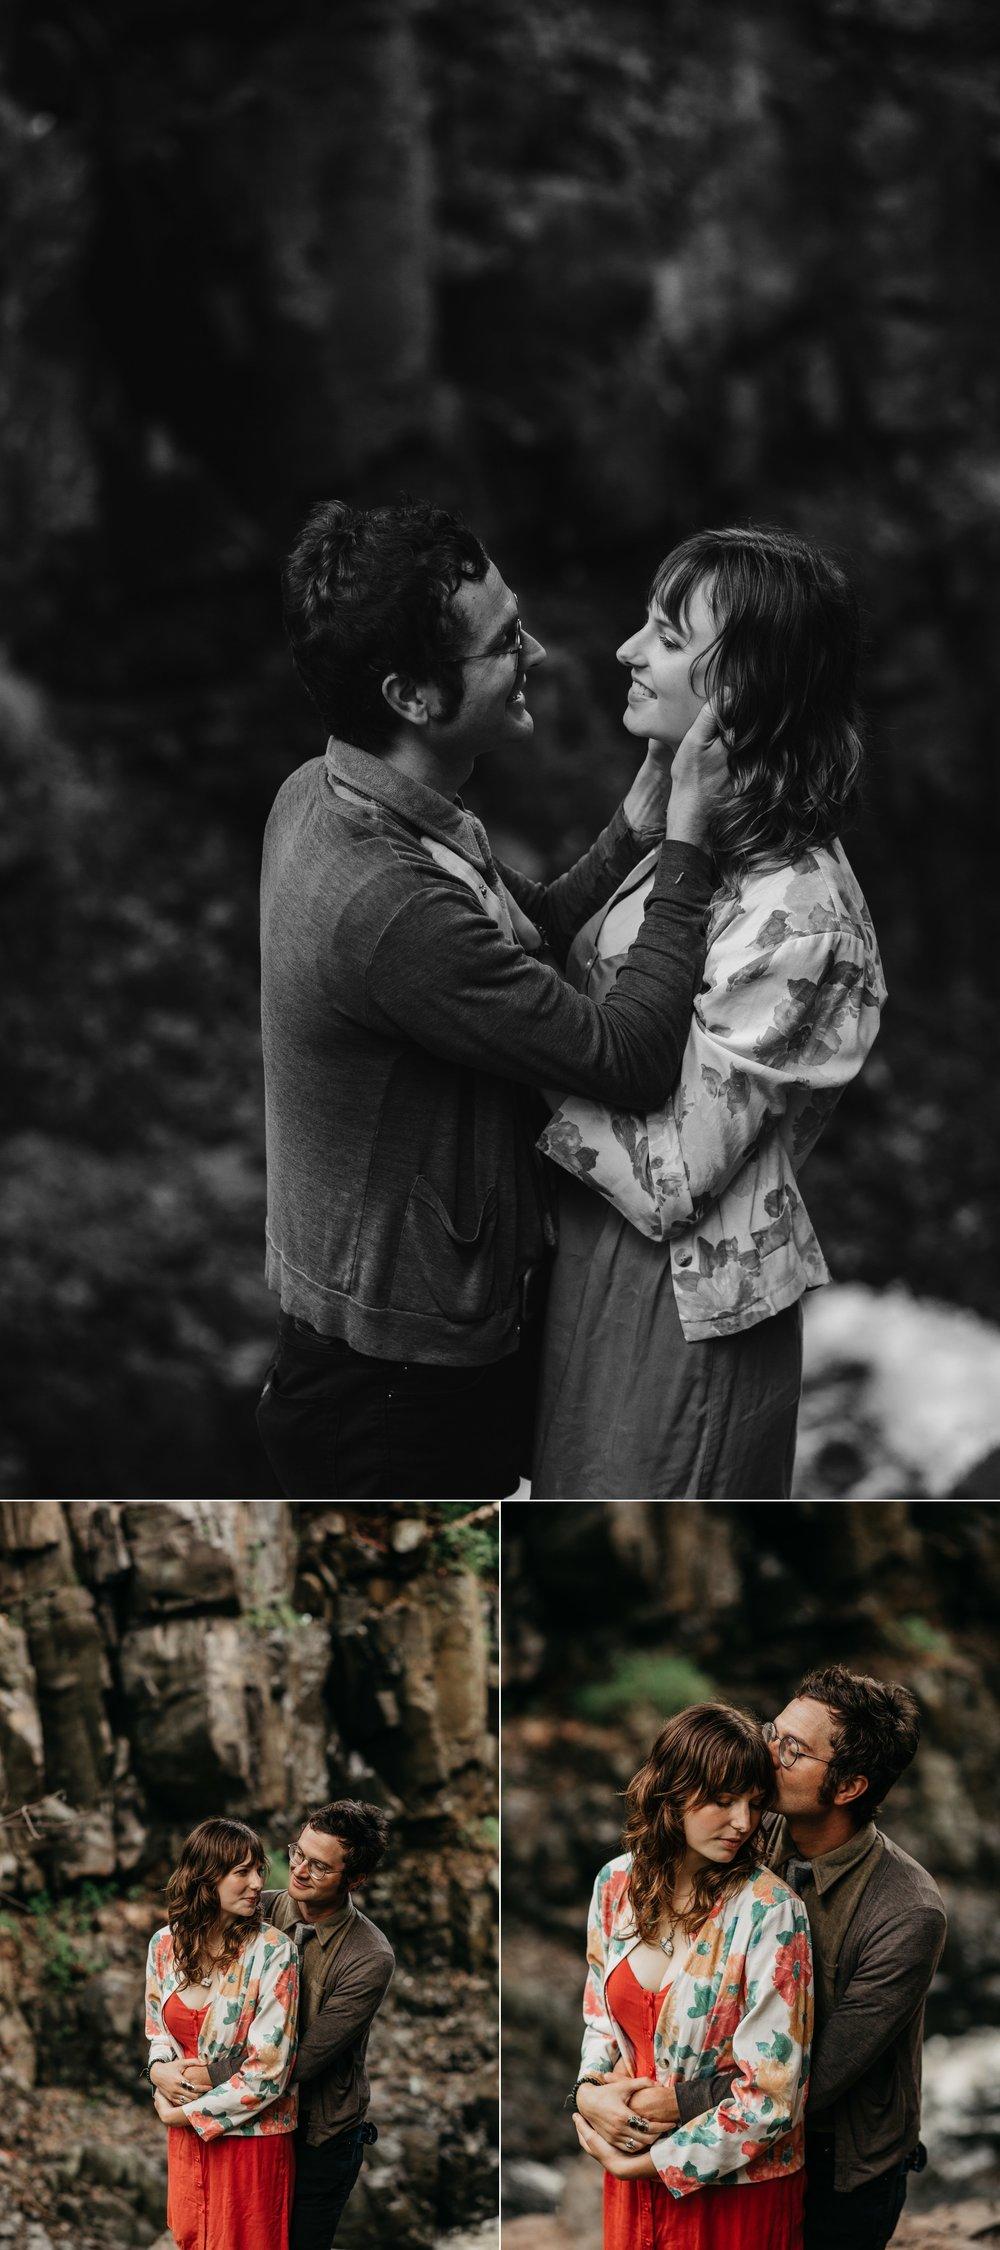 mandy aaron engagement minneapolis minnesota texas austin wedding elopement destination intimate best photographer_0130.jpg